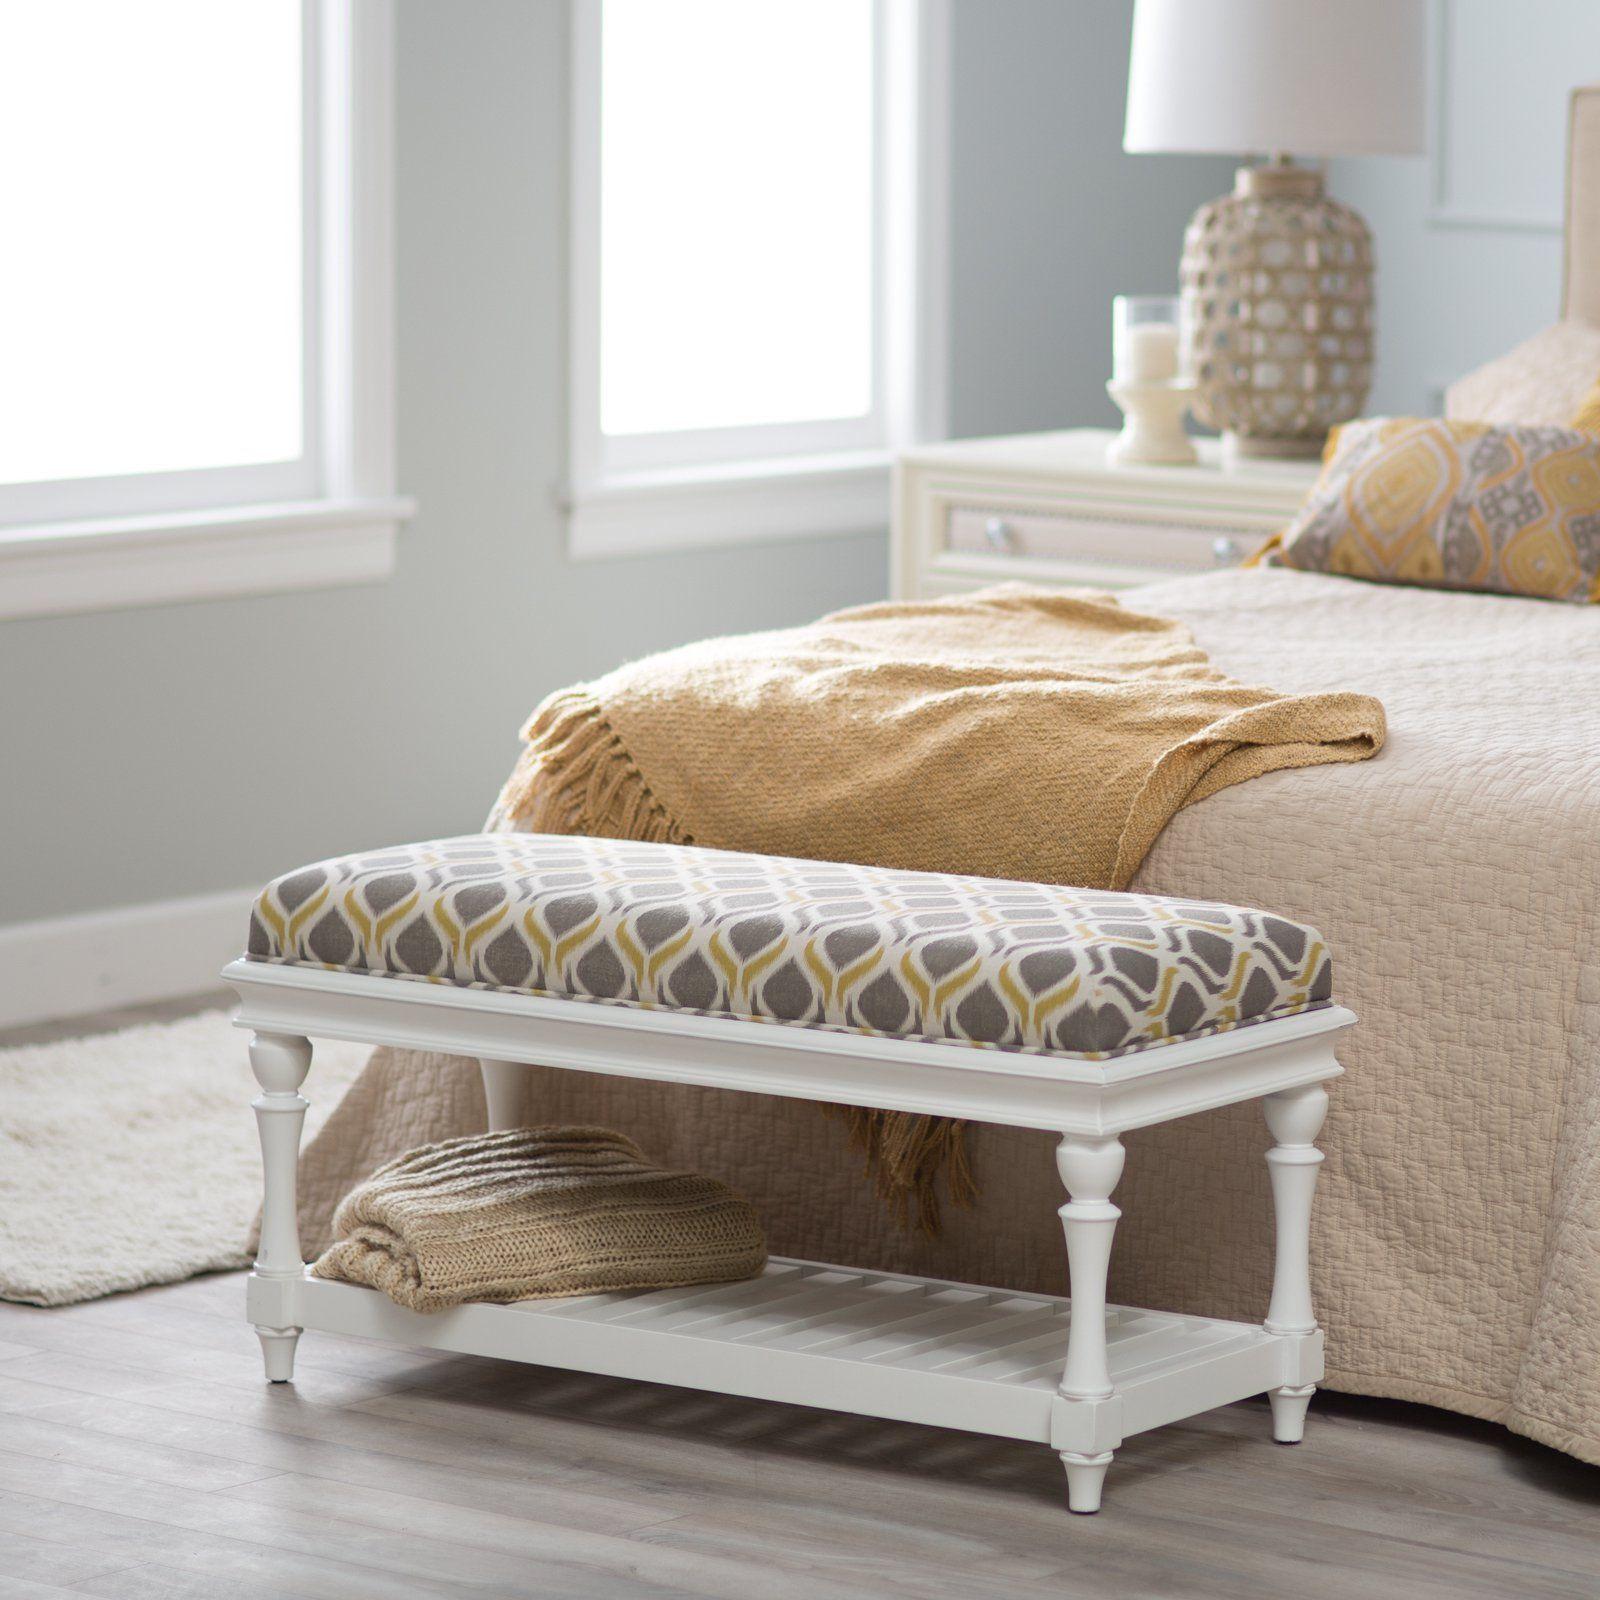 Small Bedroom Benches In 2020 Bedroom Bench Stylish Bedroom Bedroom Design Trends